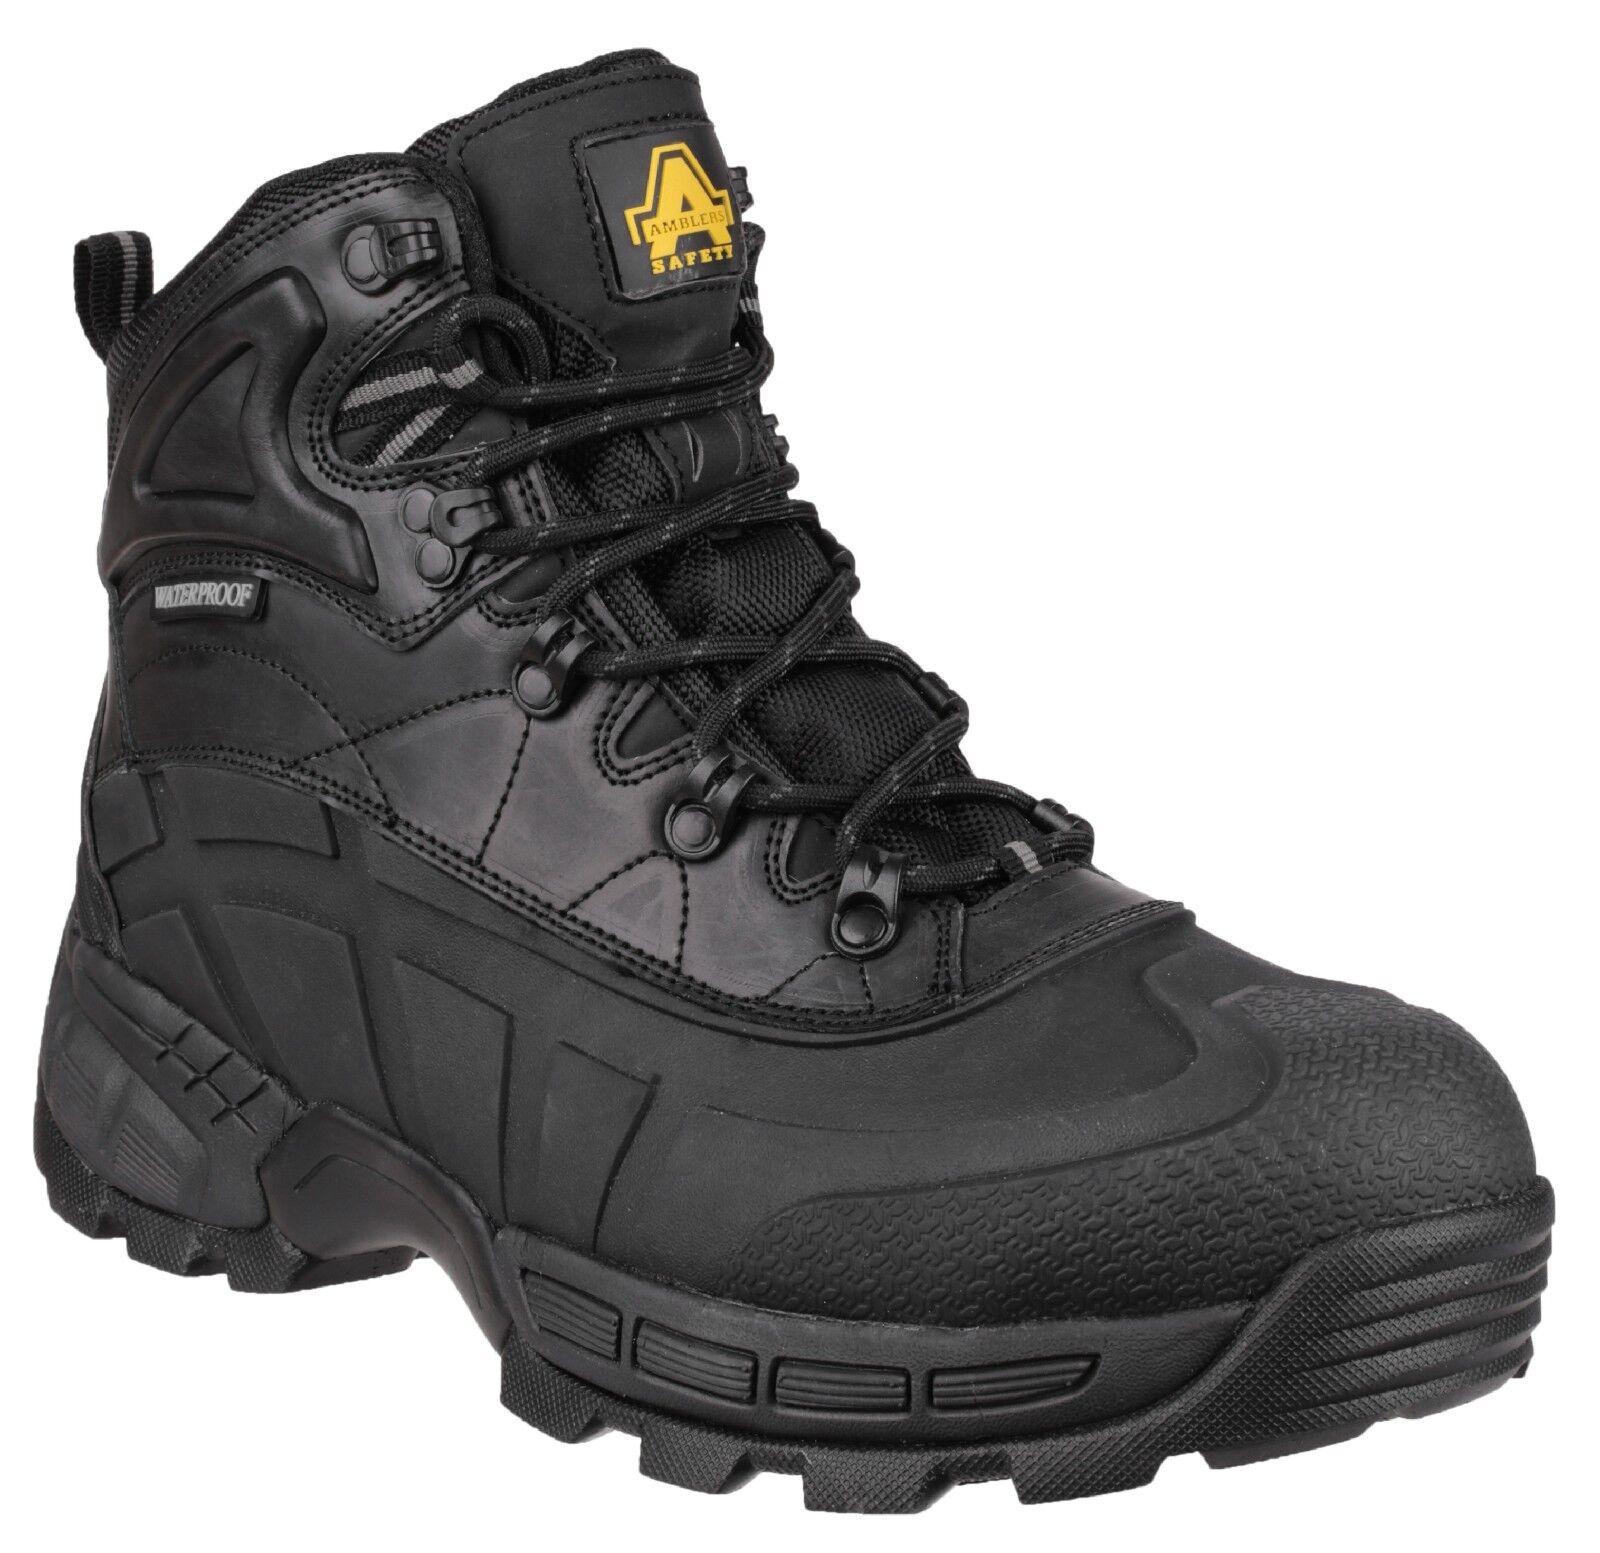 Amblers fs430 Orca S3 Impermeable Seguridad botas De Trabajo Negro 6-12 ligero